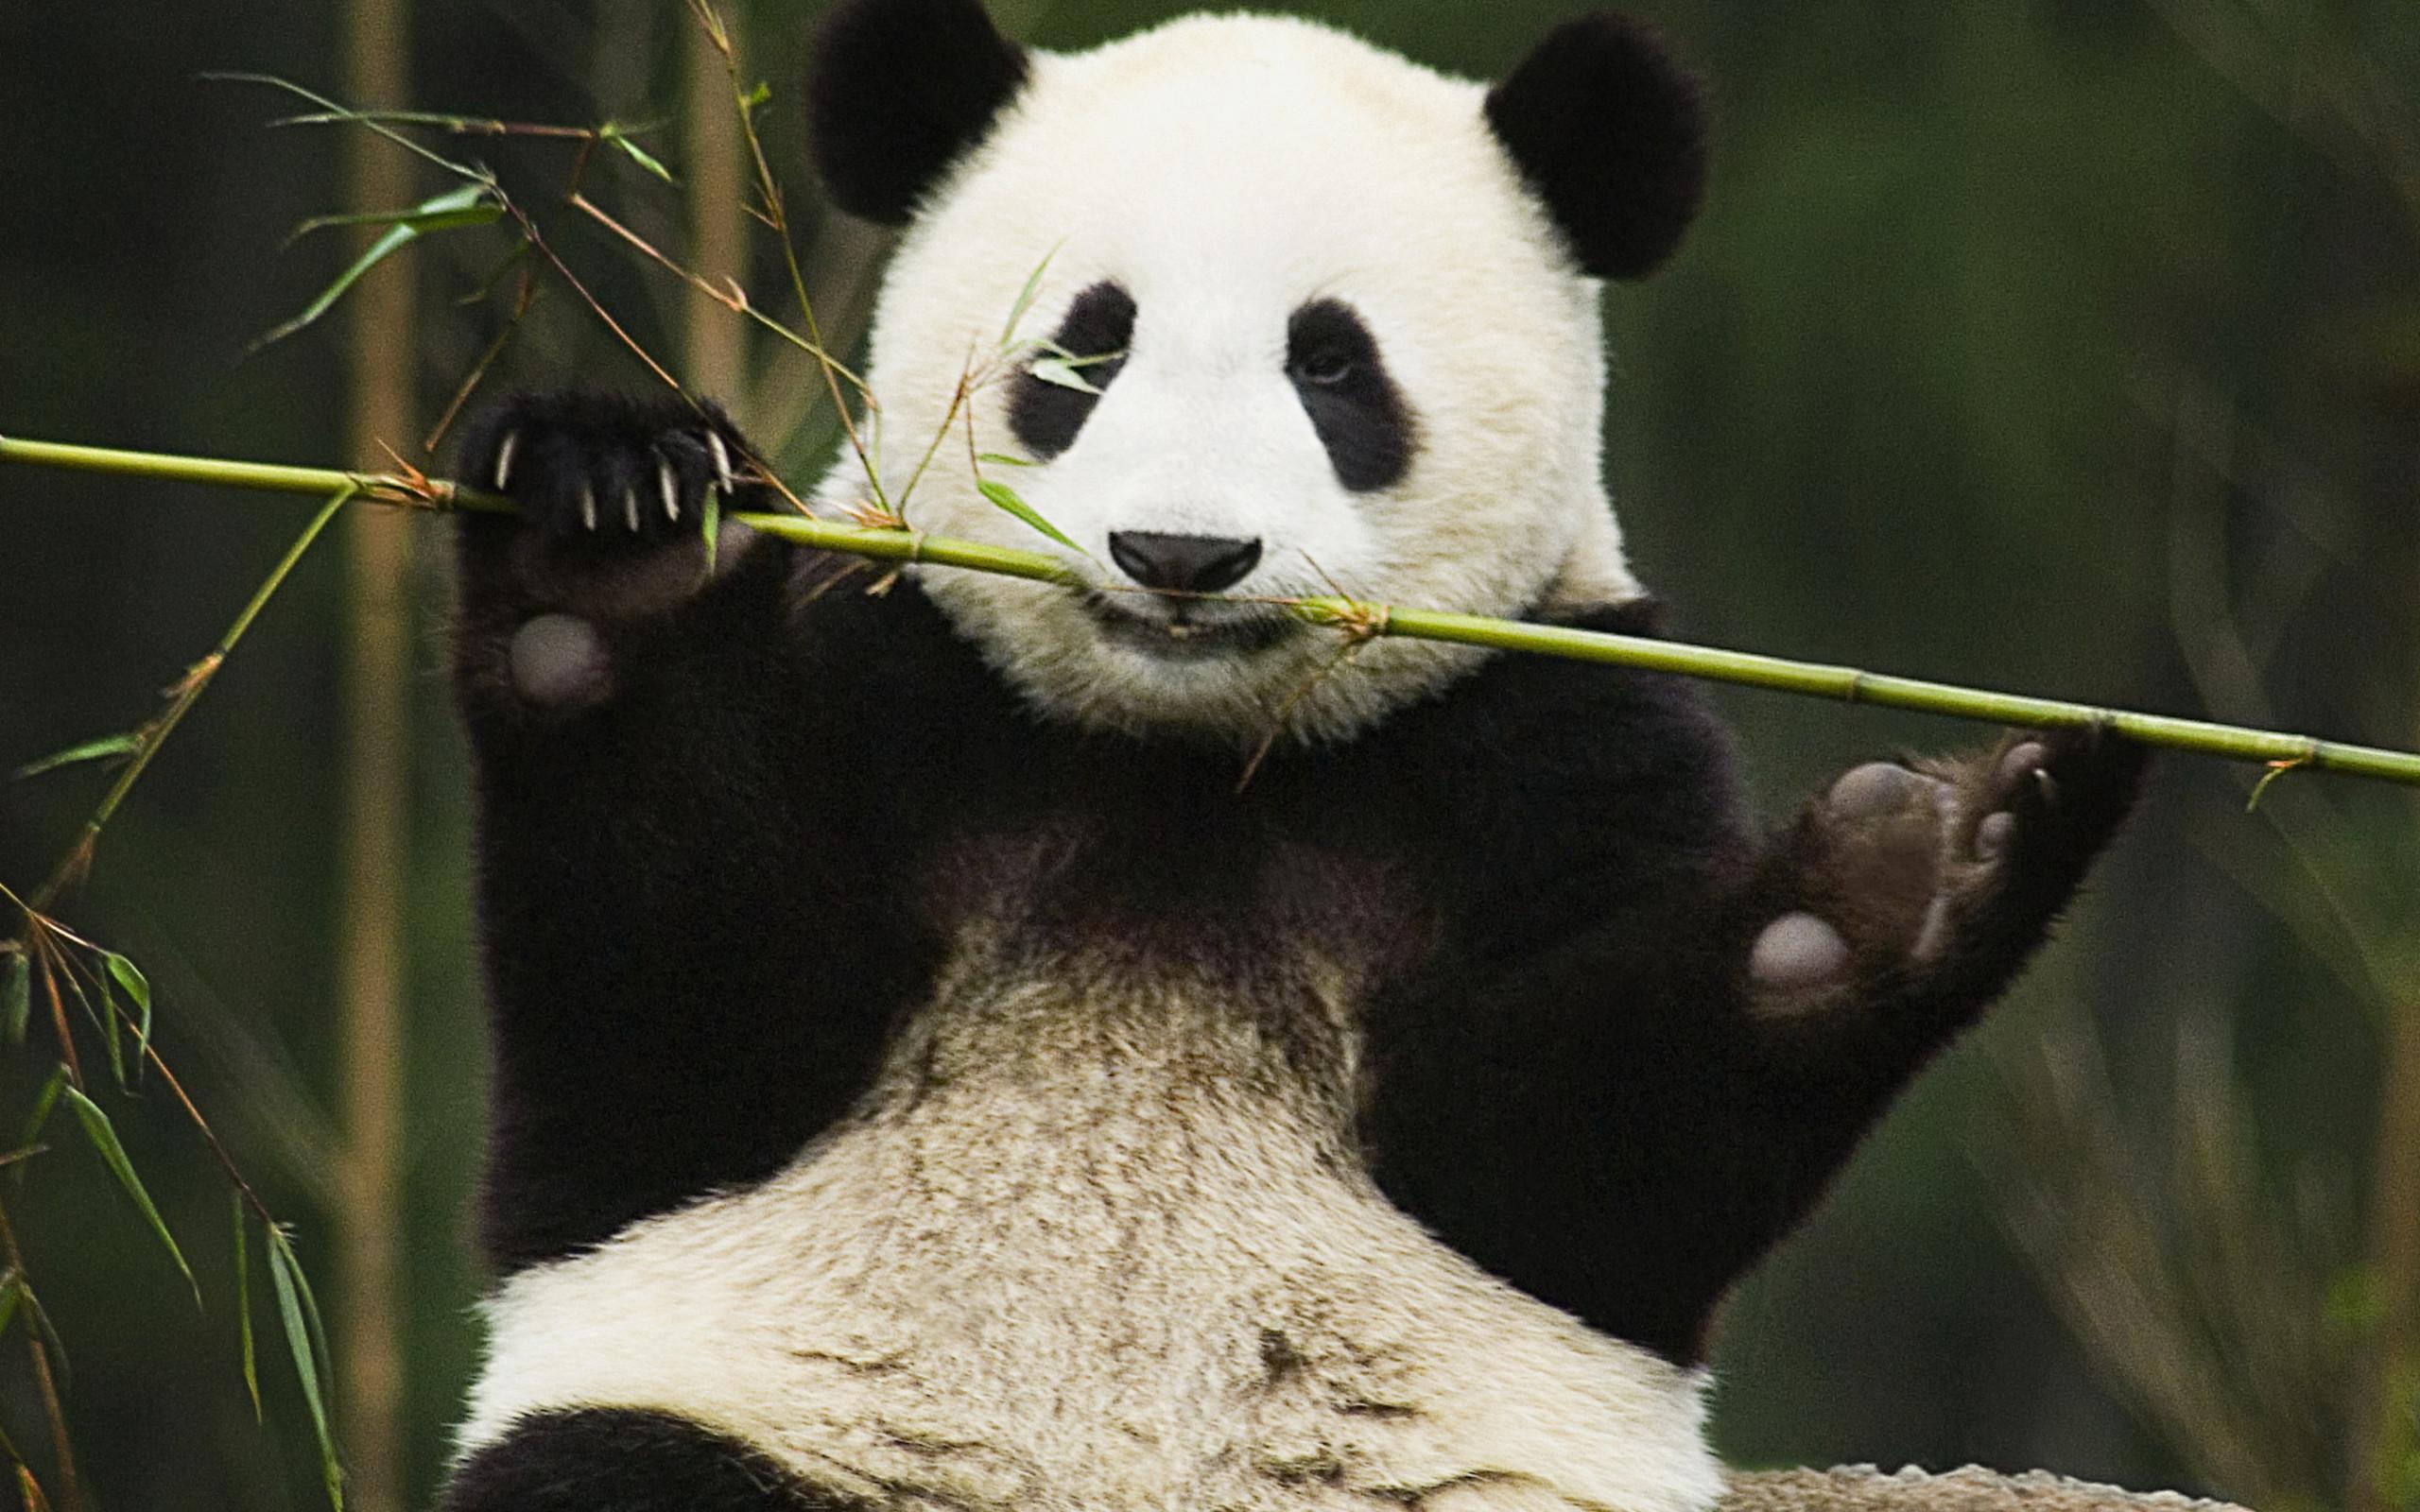 Res: 2560x1600, HD Wallpaper   Background Image ID:429544.  Animal Panda